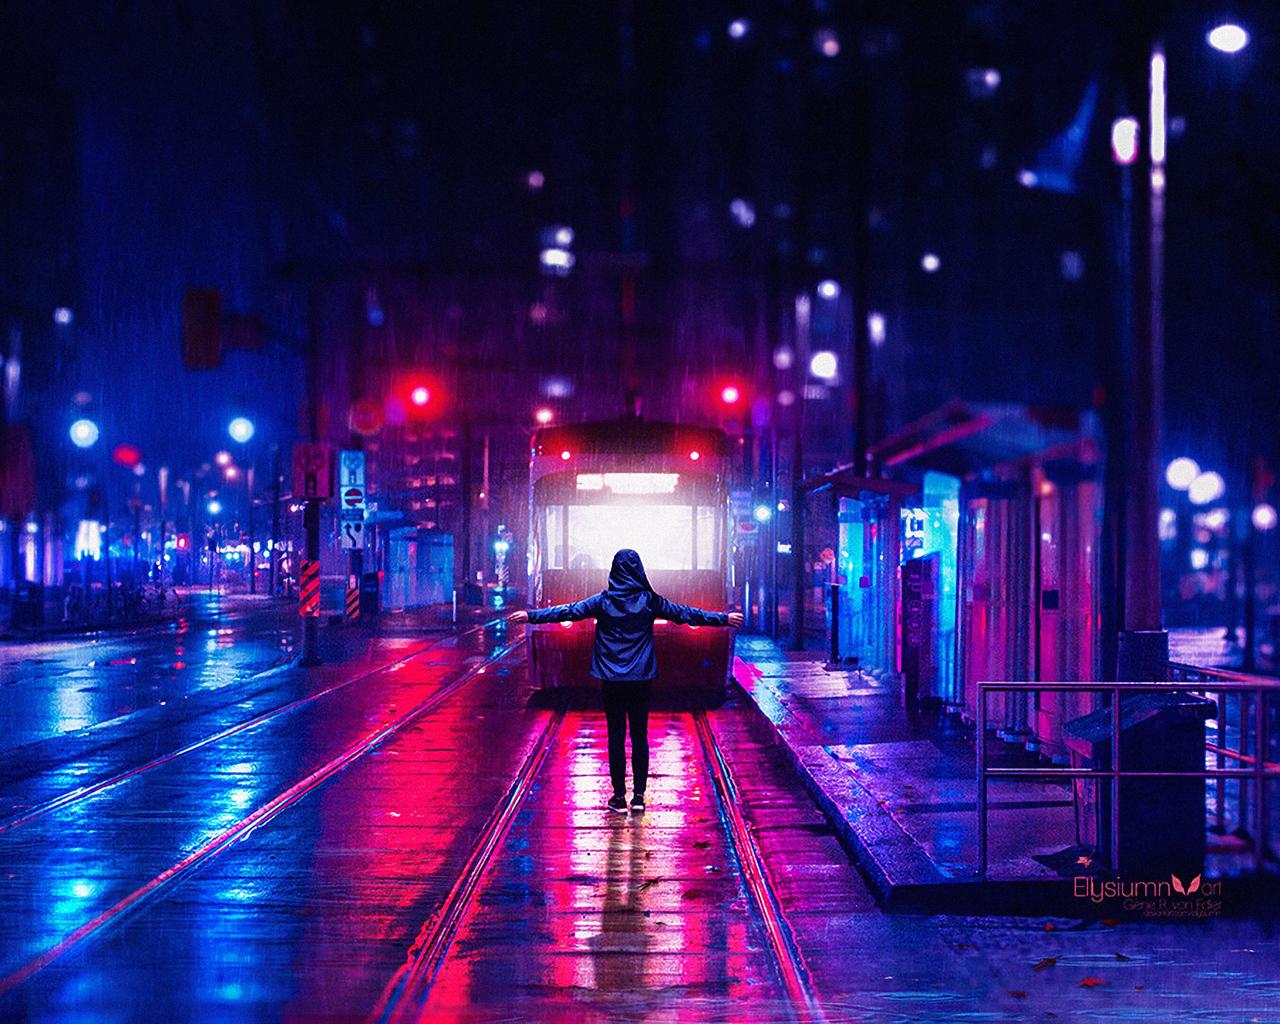 under-the-rain-railroad-7k.jpg